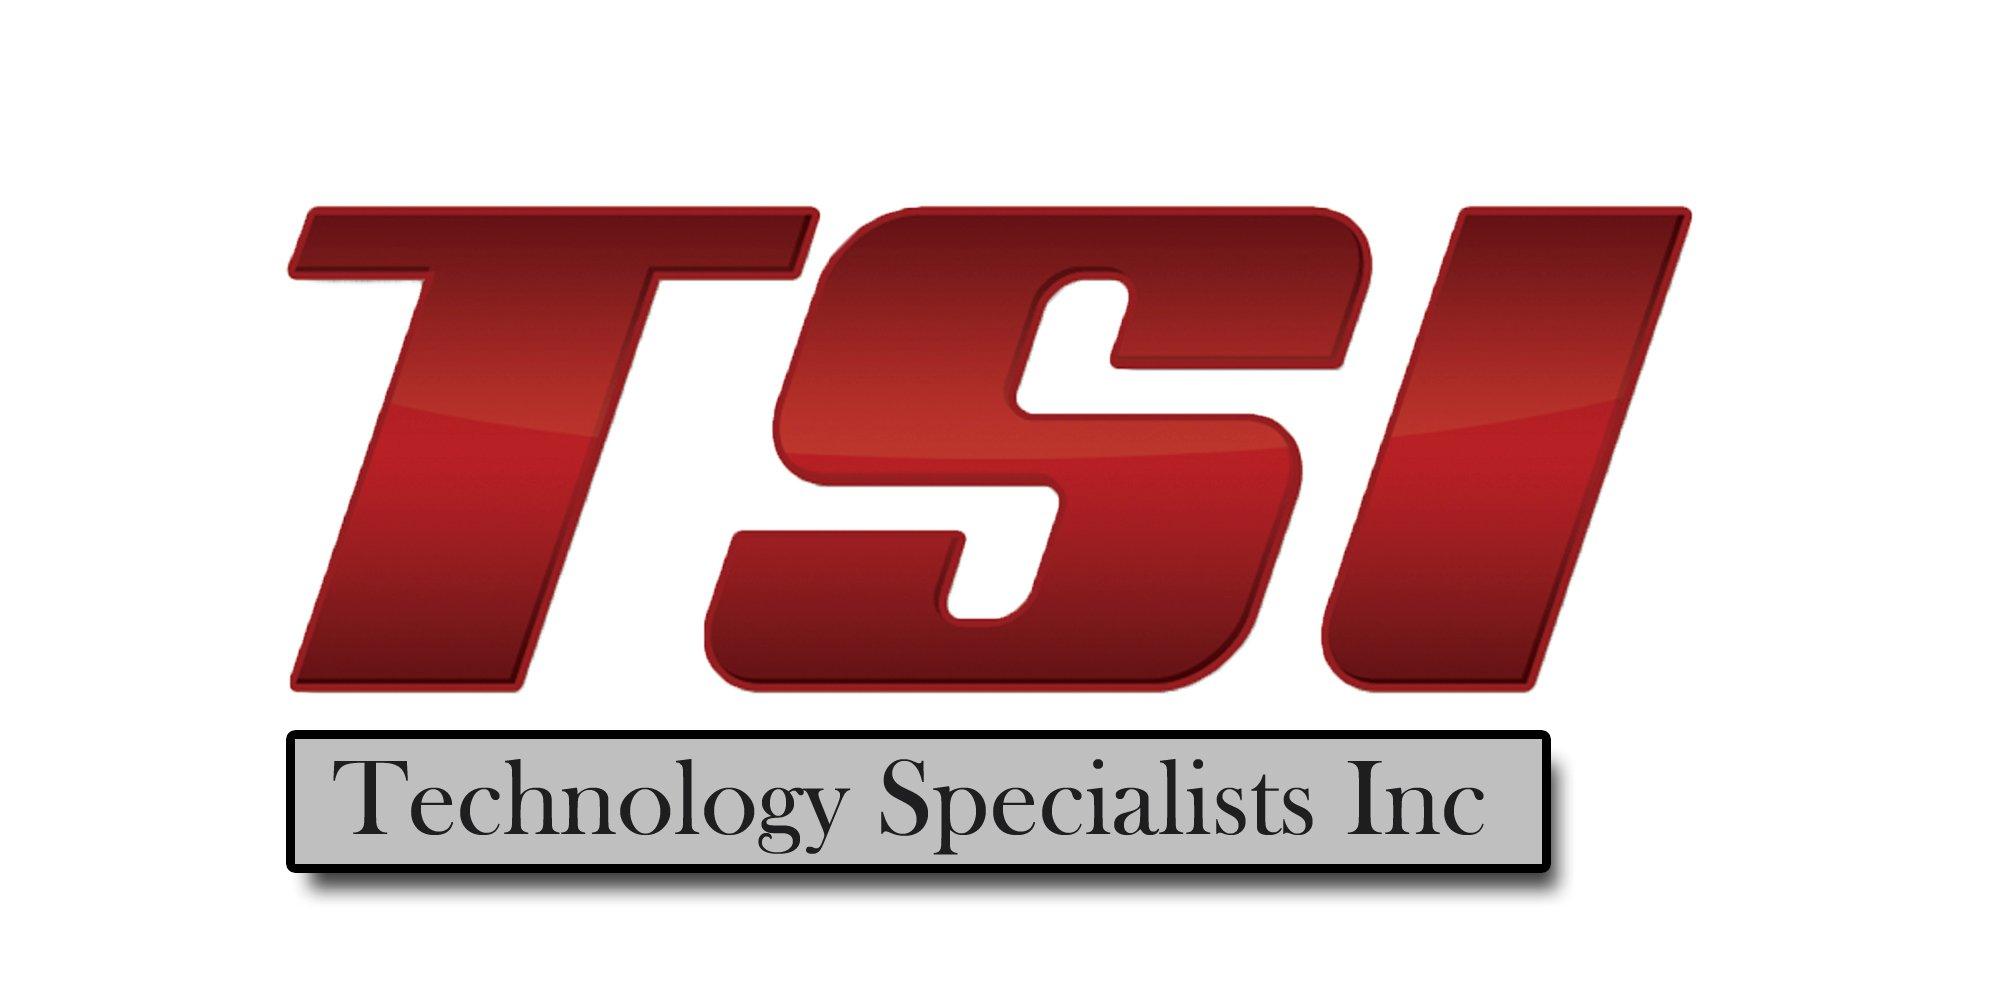 Cisco telepresence logo